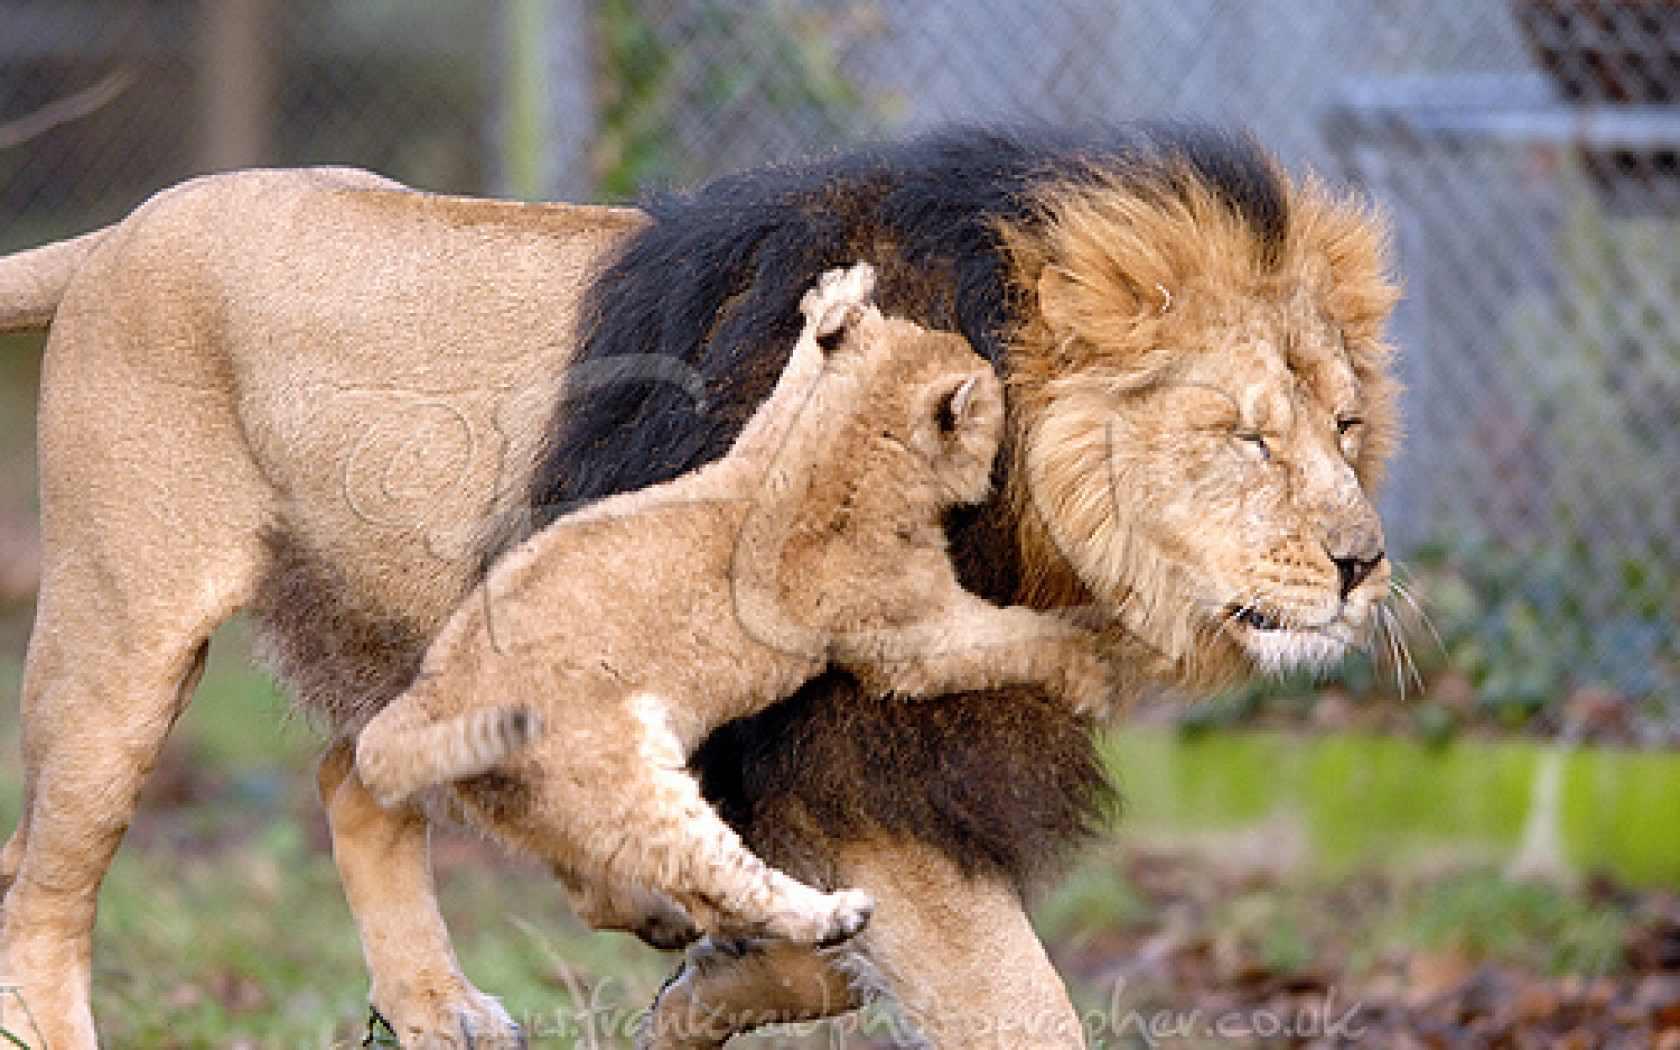 My favorite animal lion essay